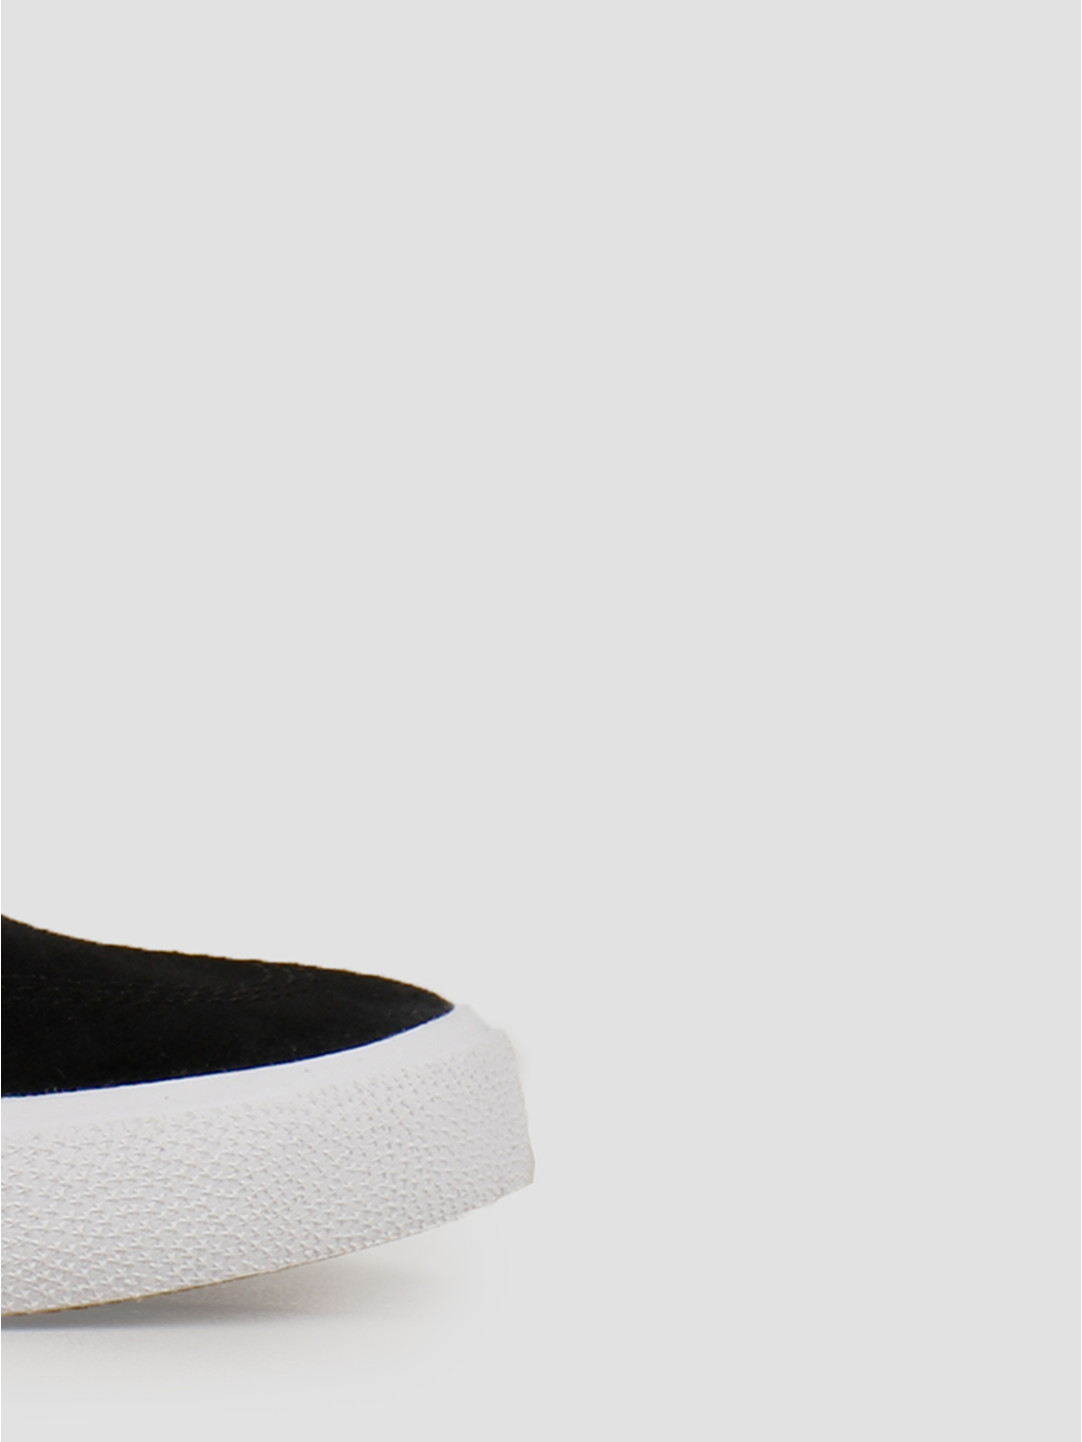 Nike Nike SB Zoom Janoski Rm Black White Thunder Grey Gum Light Brown AQ7475-001